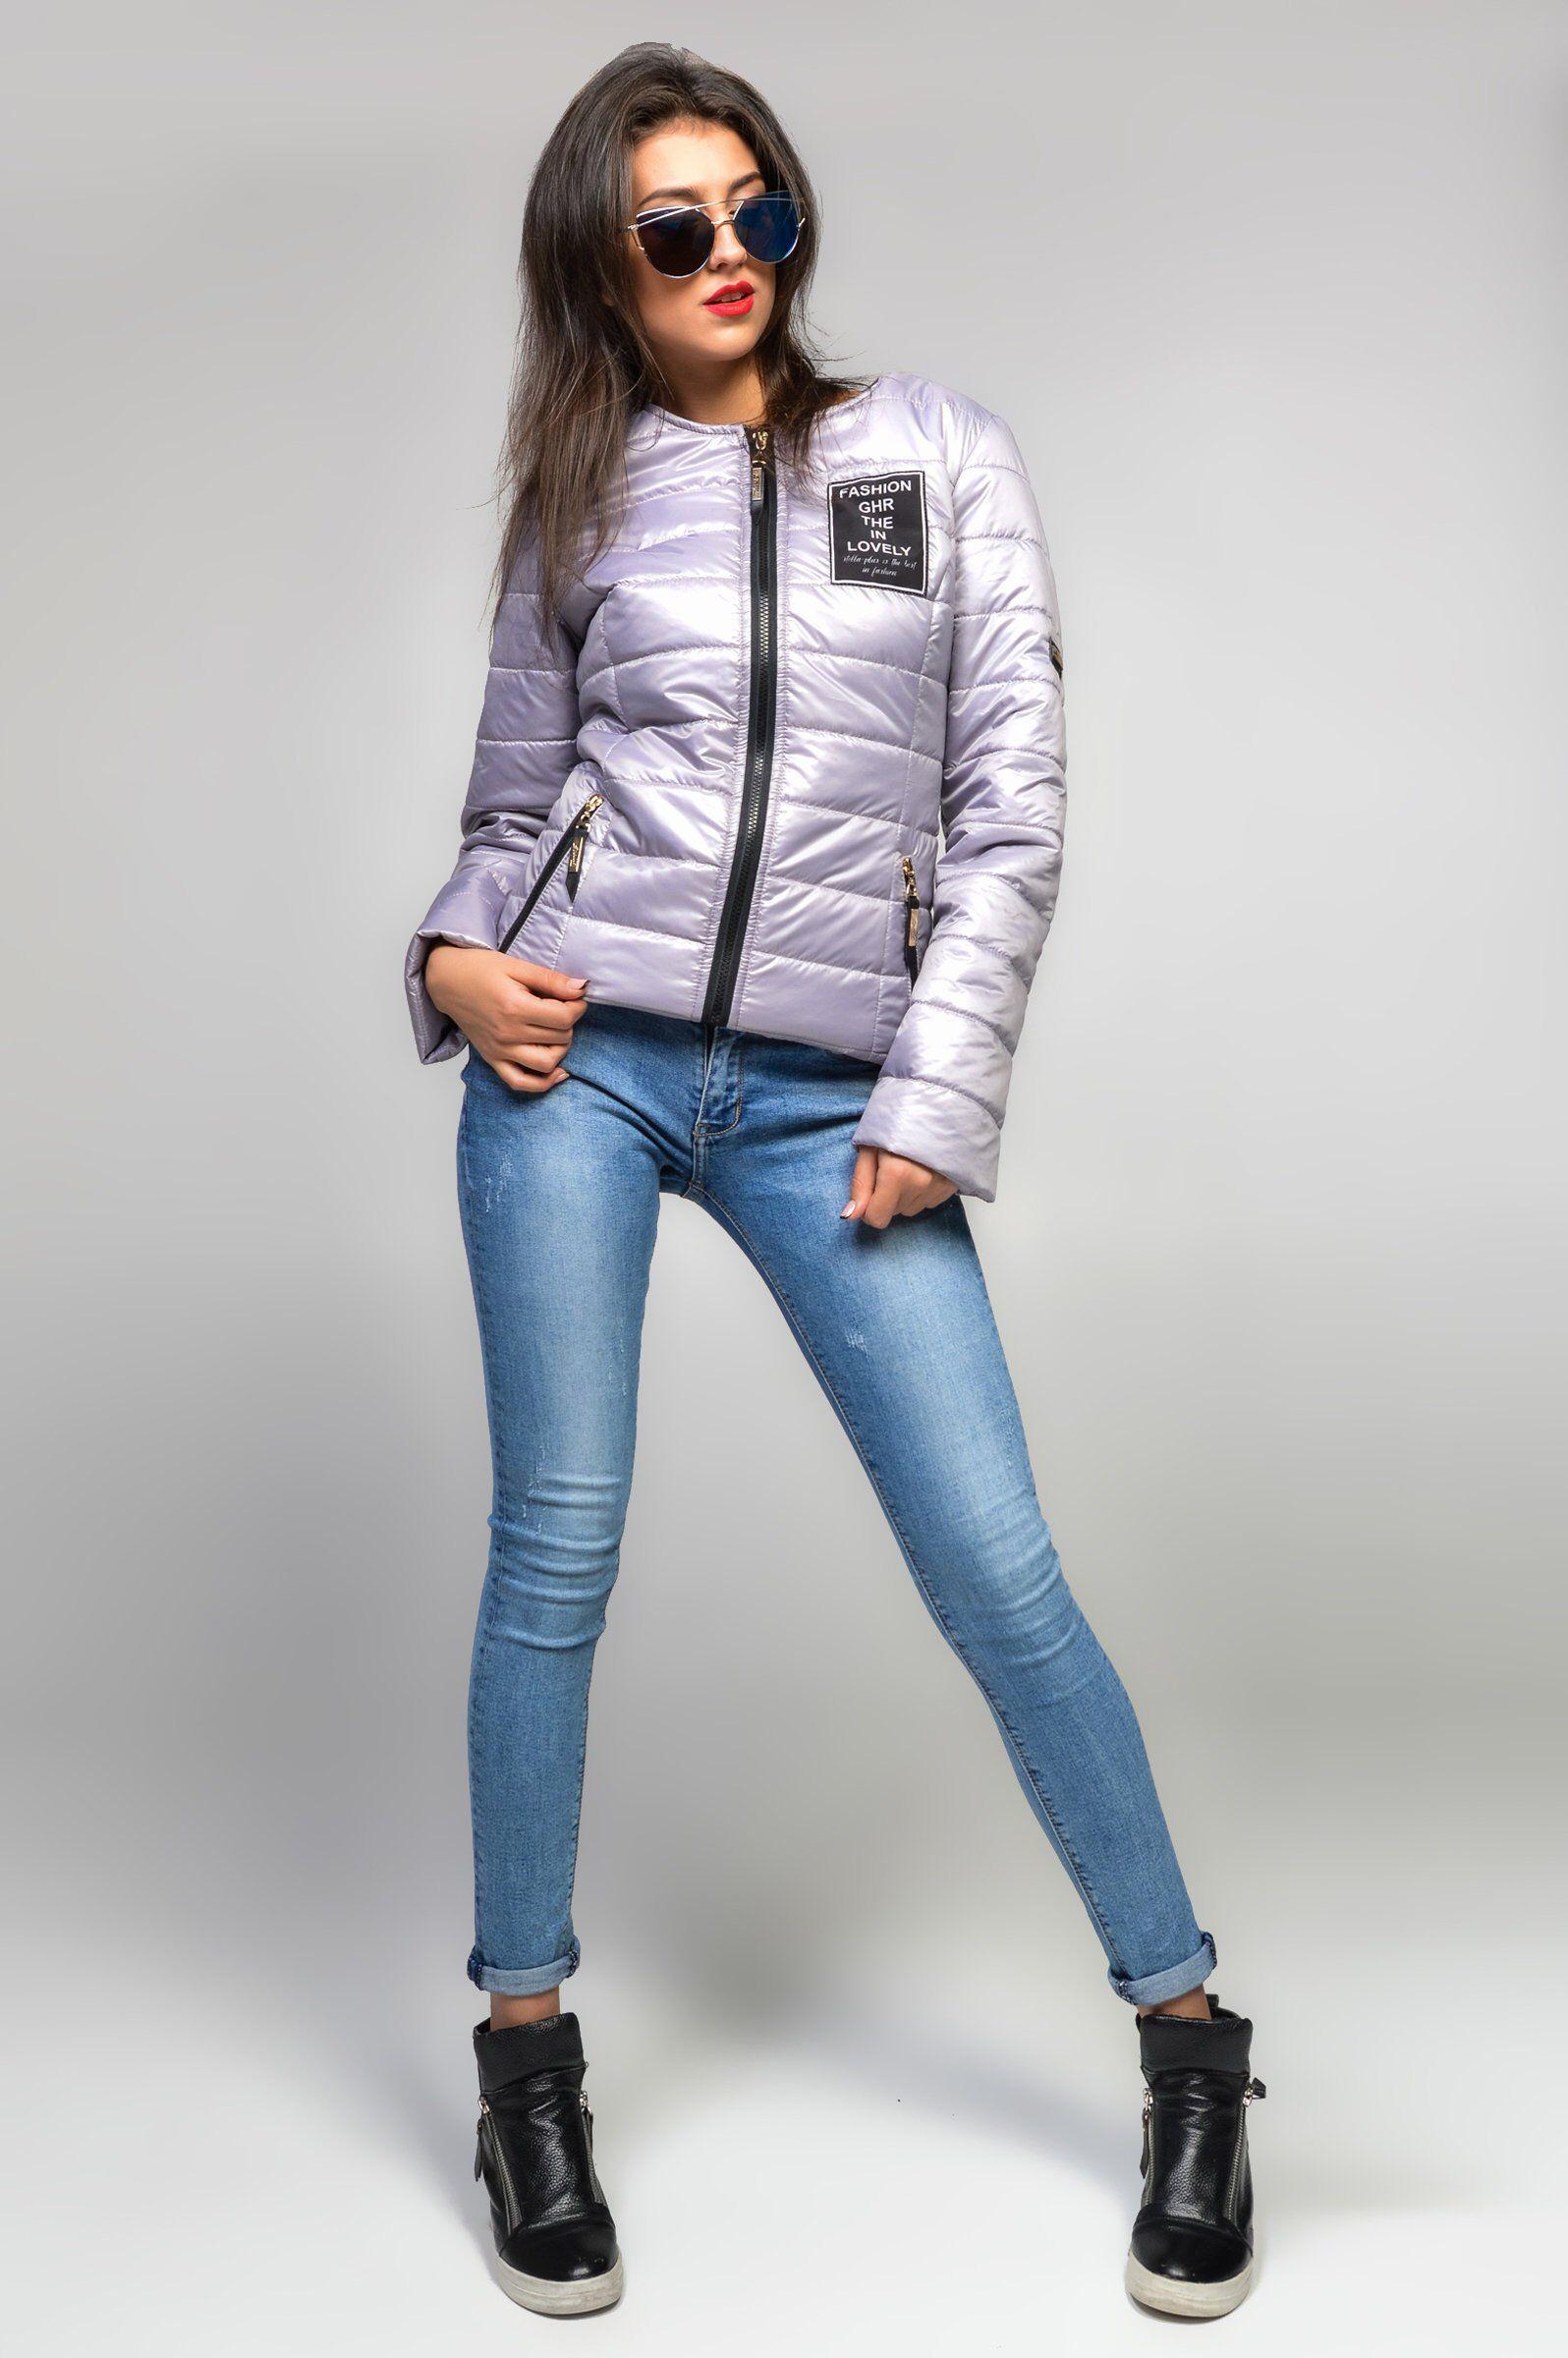 Silver Metallic Quilted Puffy Jacket Women Autumn Winter